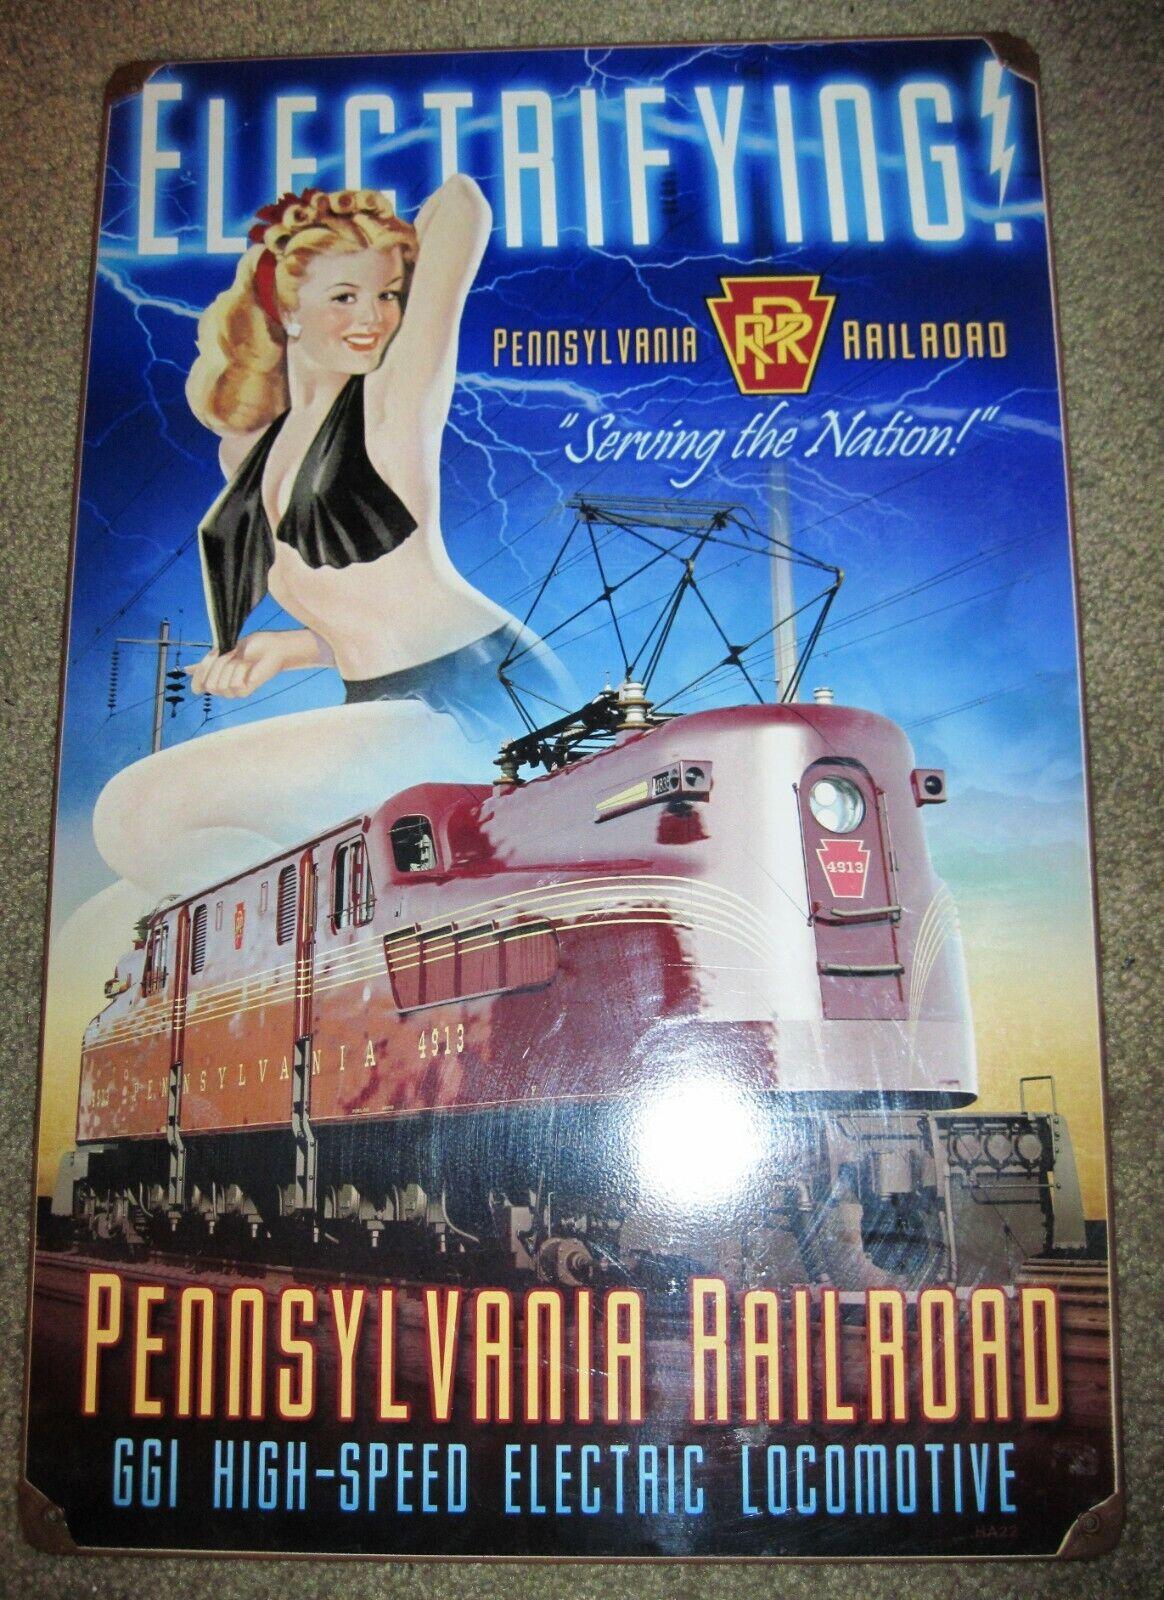 Repro Vintage Pennsylvania Railroad GG-1 Electrifying railroad picture 11 x 17